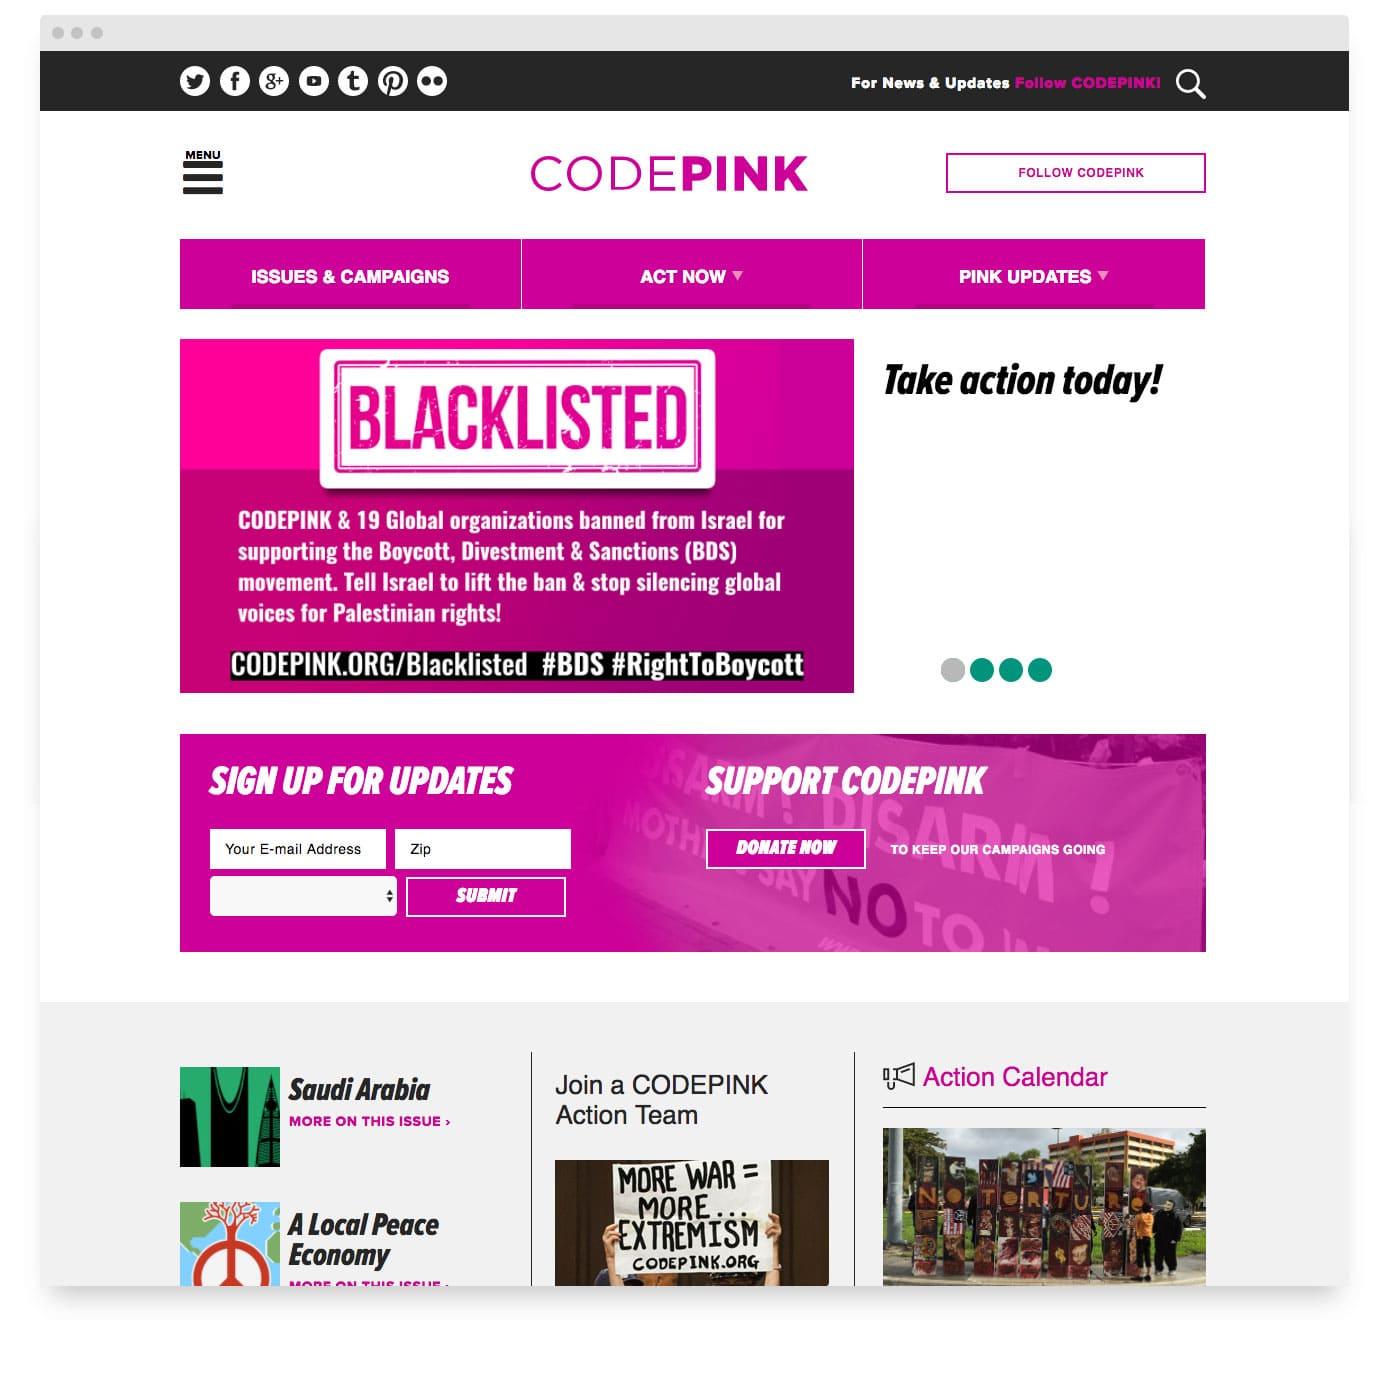 codepink-home-desktop-min.jpg